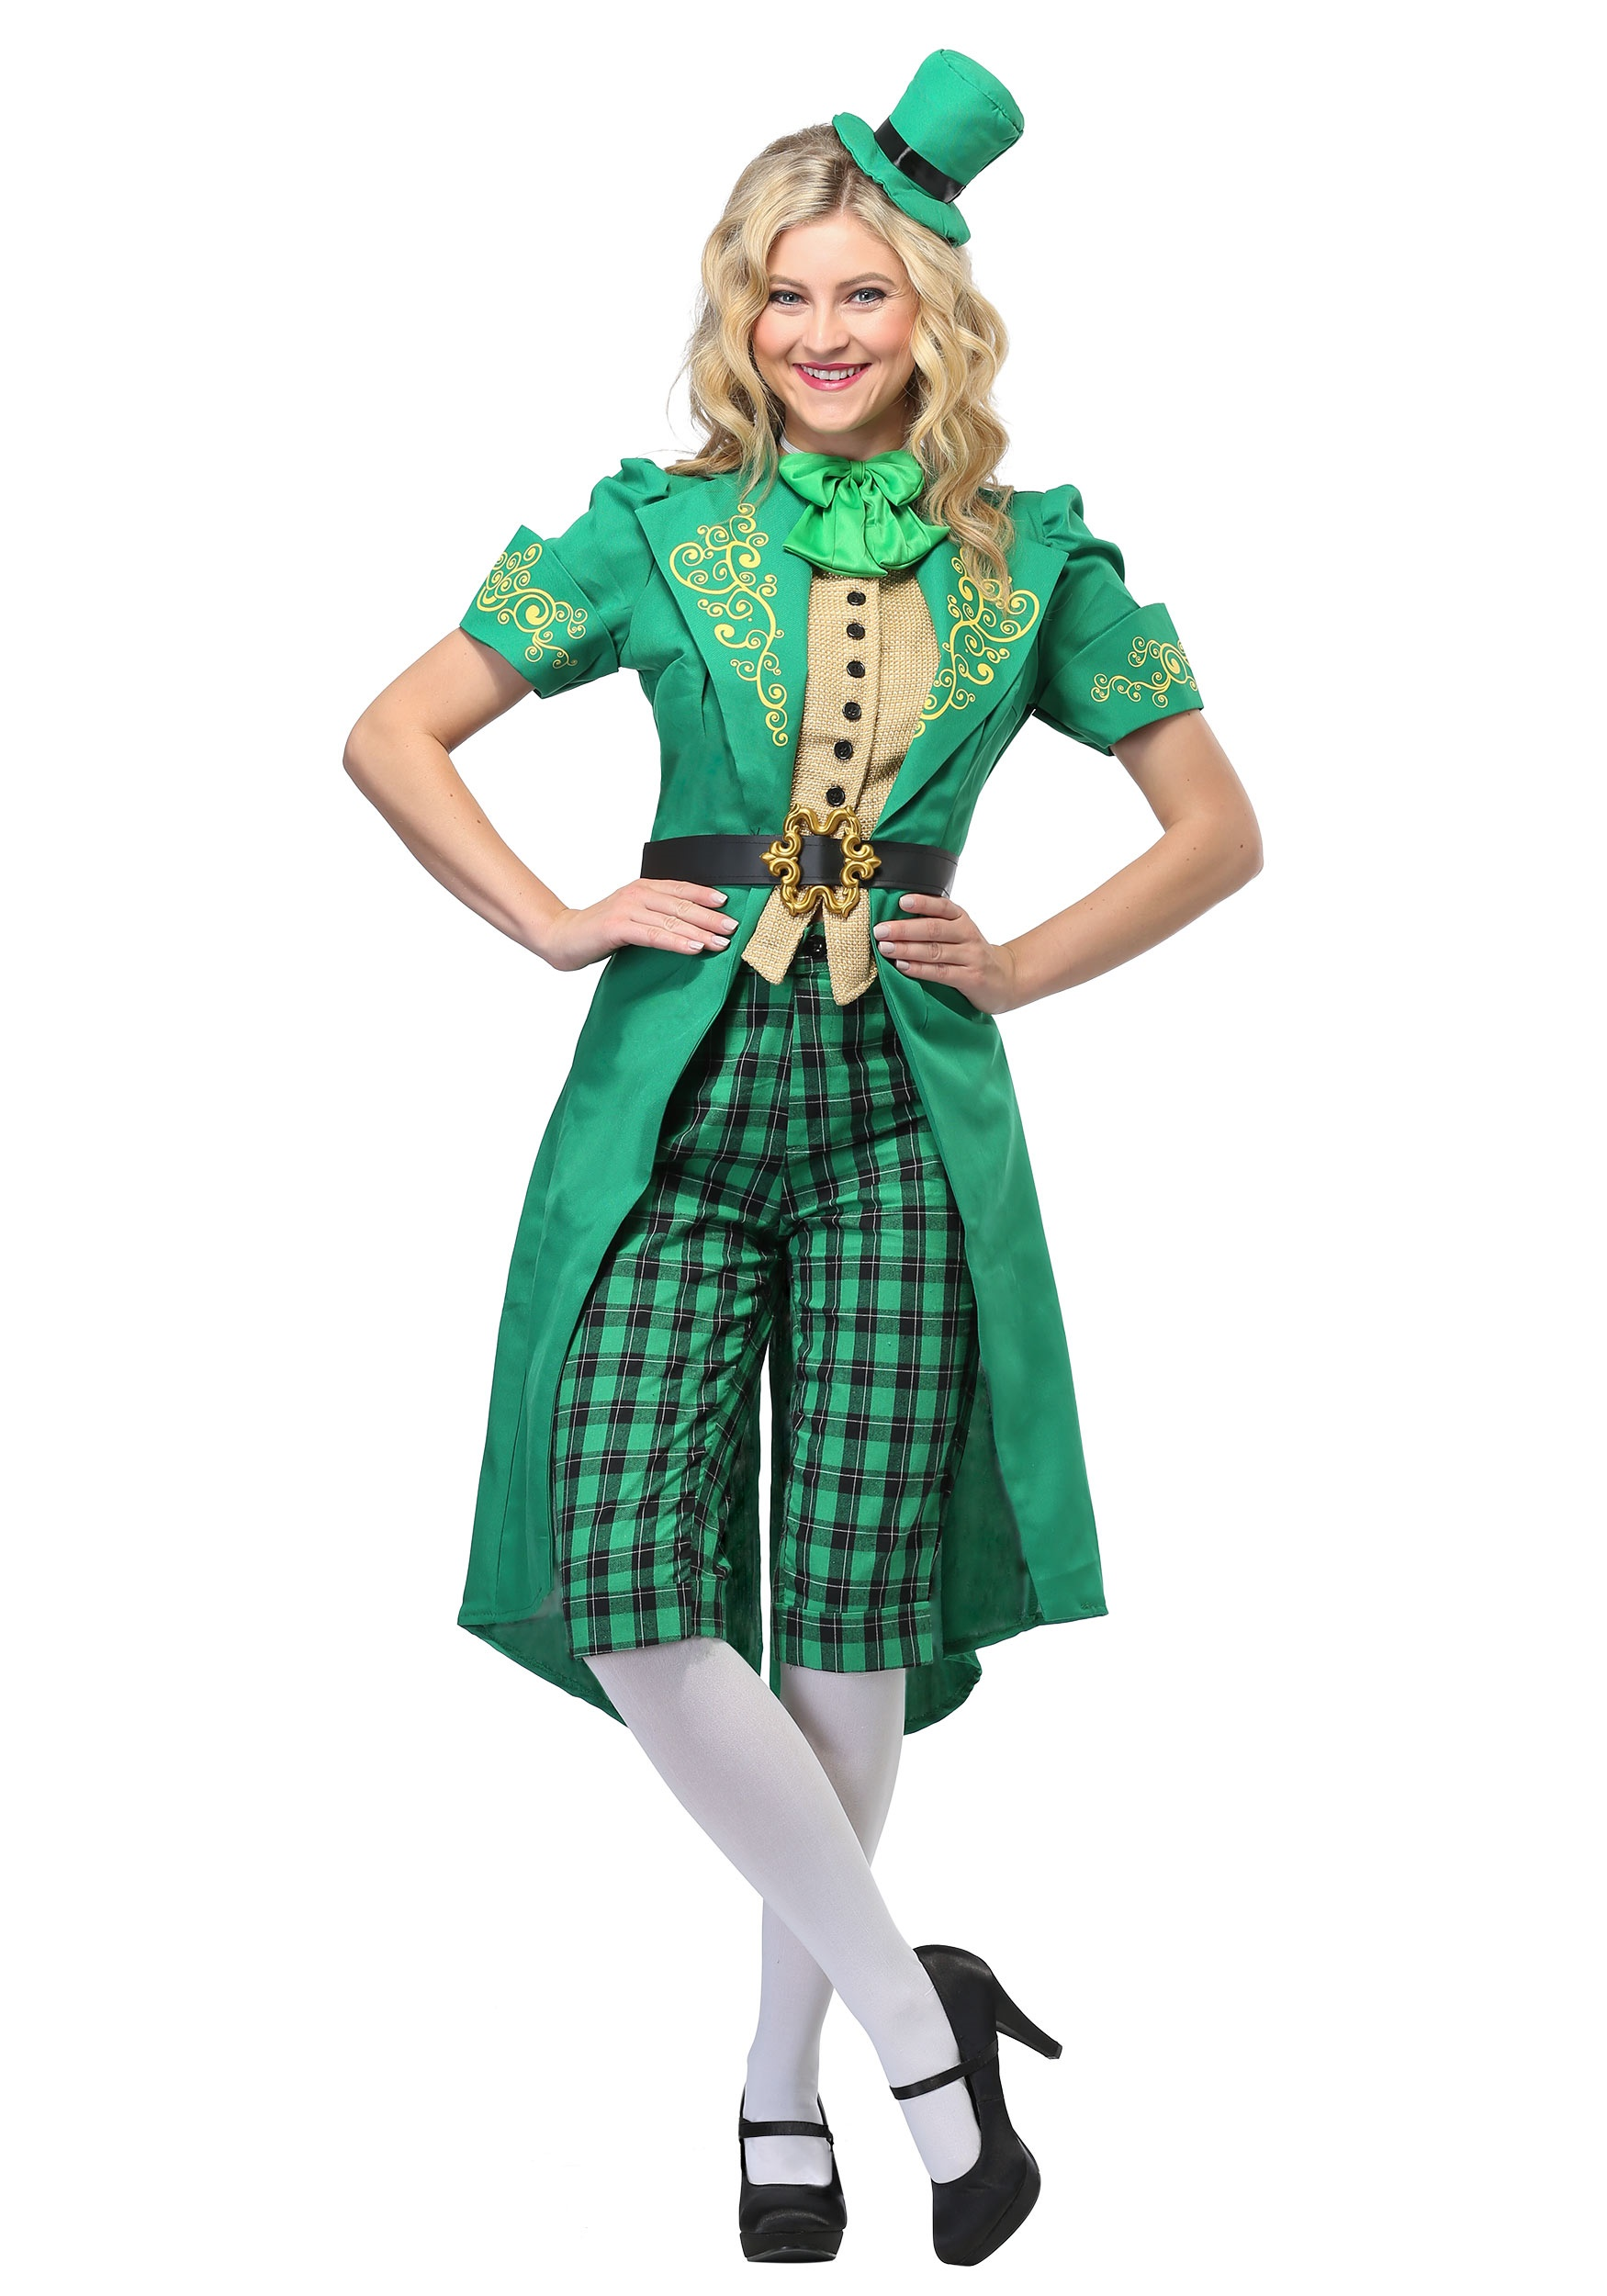 Charming Leprechaun Costume for Women